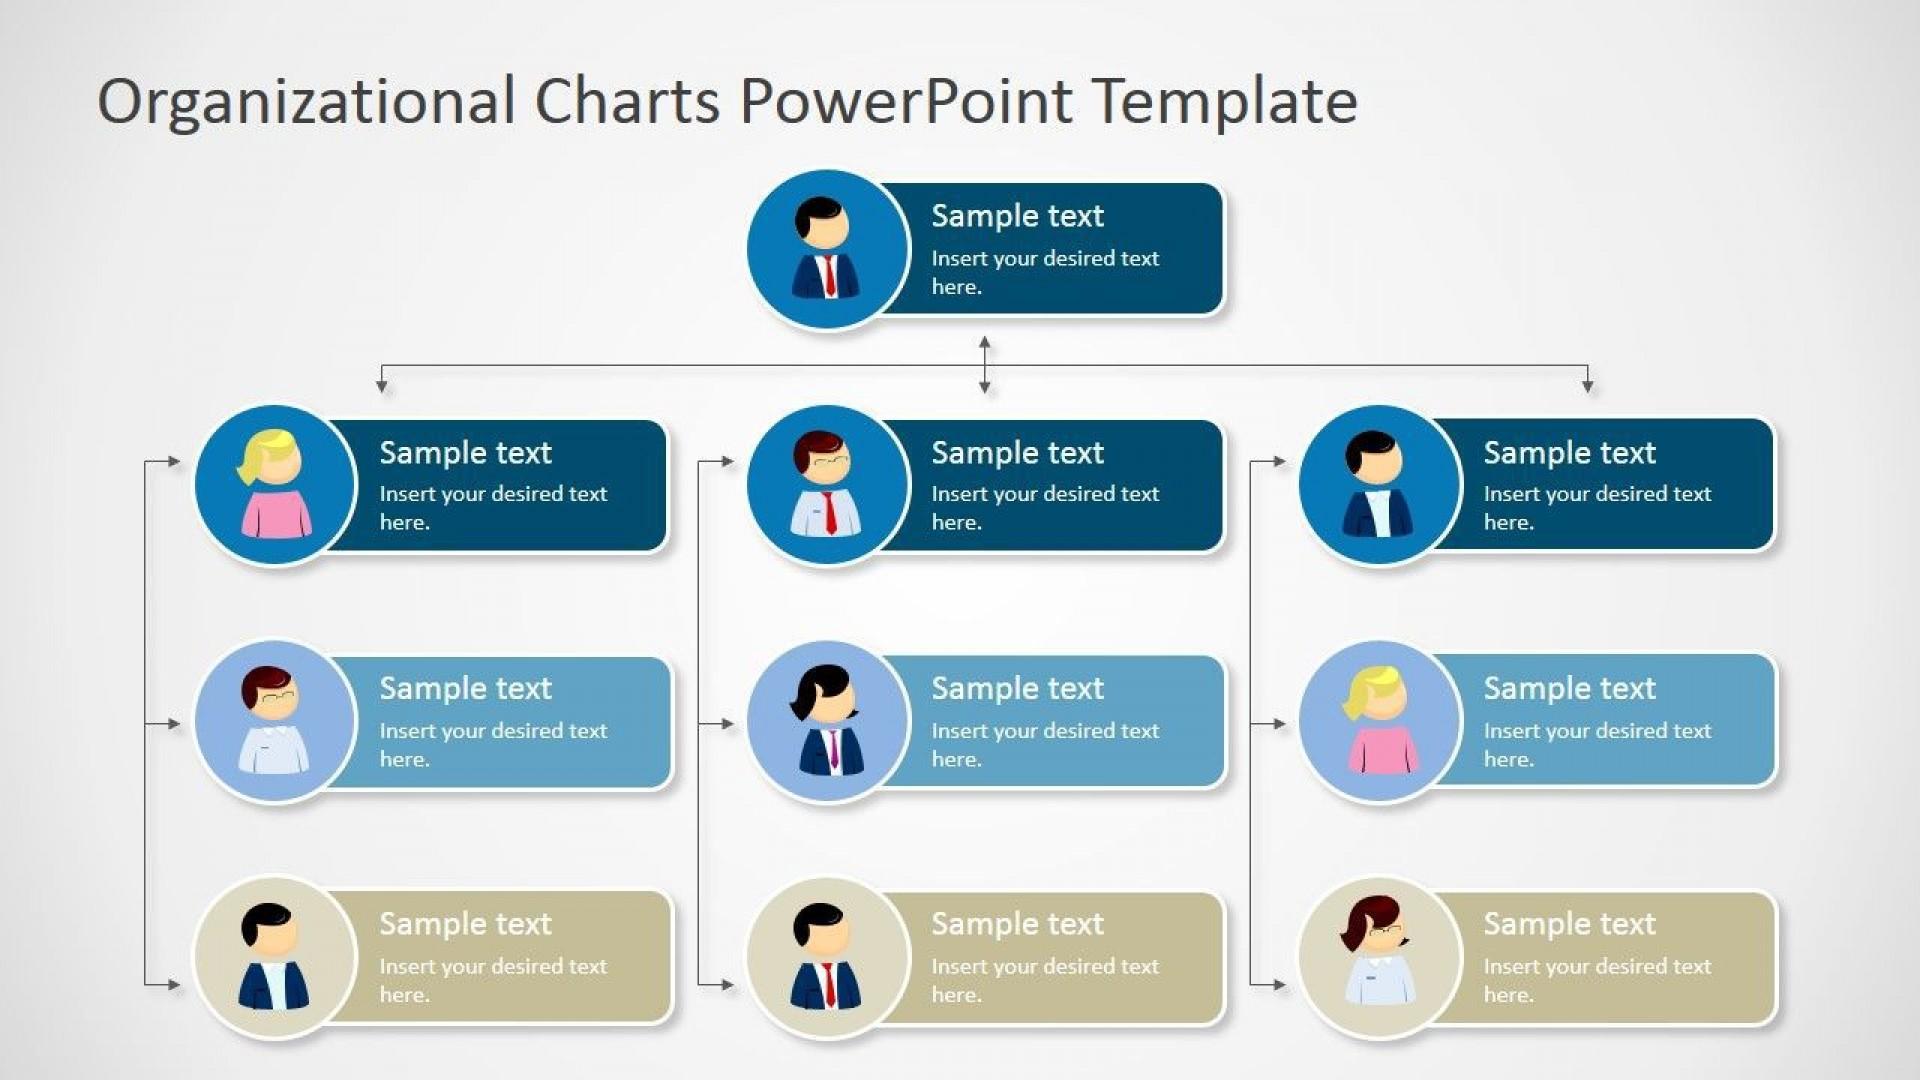 002 Staggering Organizational Chart Template Powerpoint Free Design  Download 2010 Organization1920